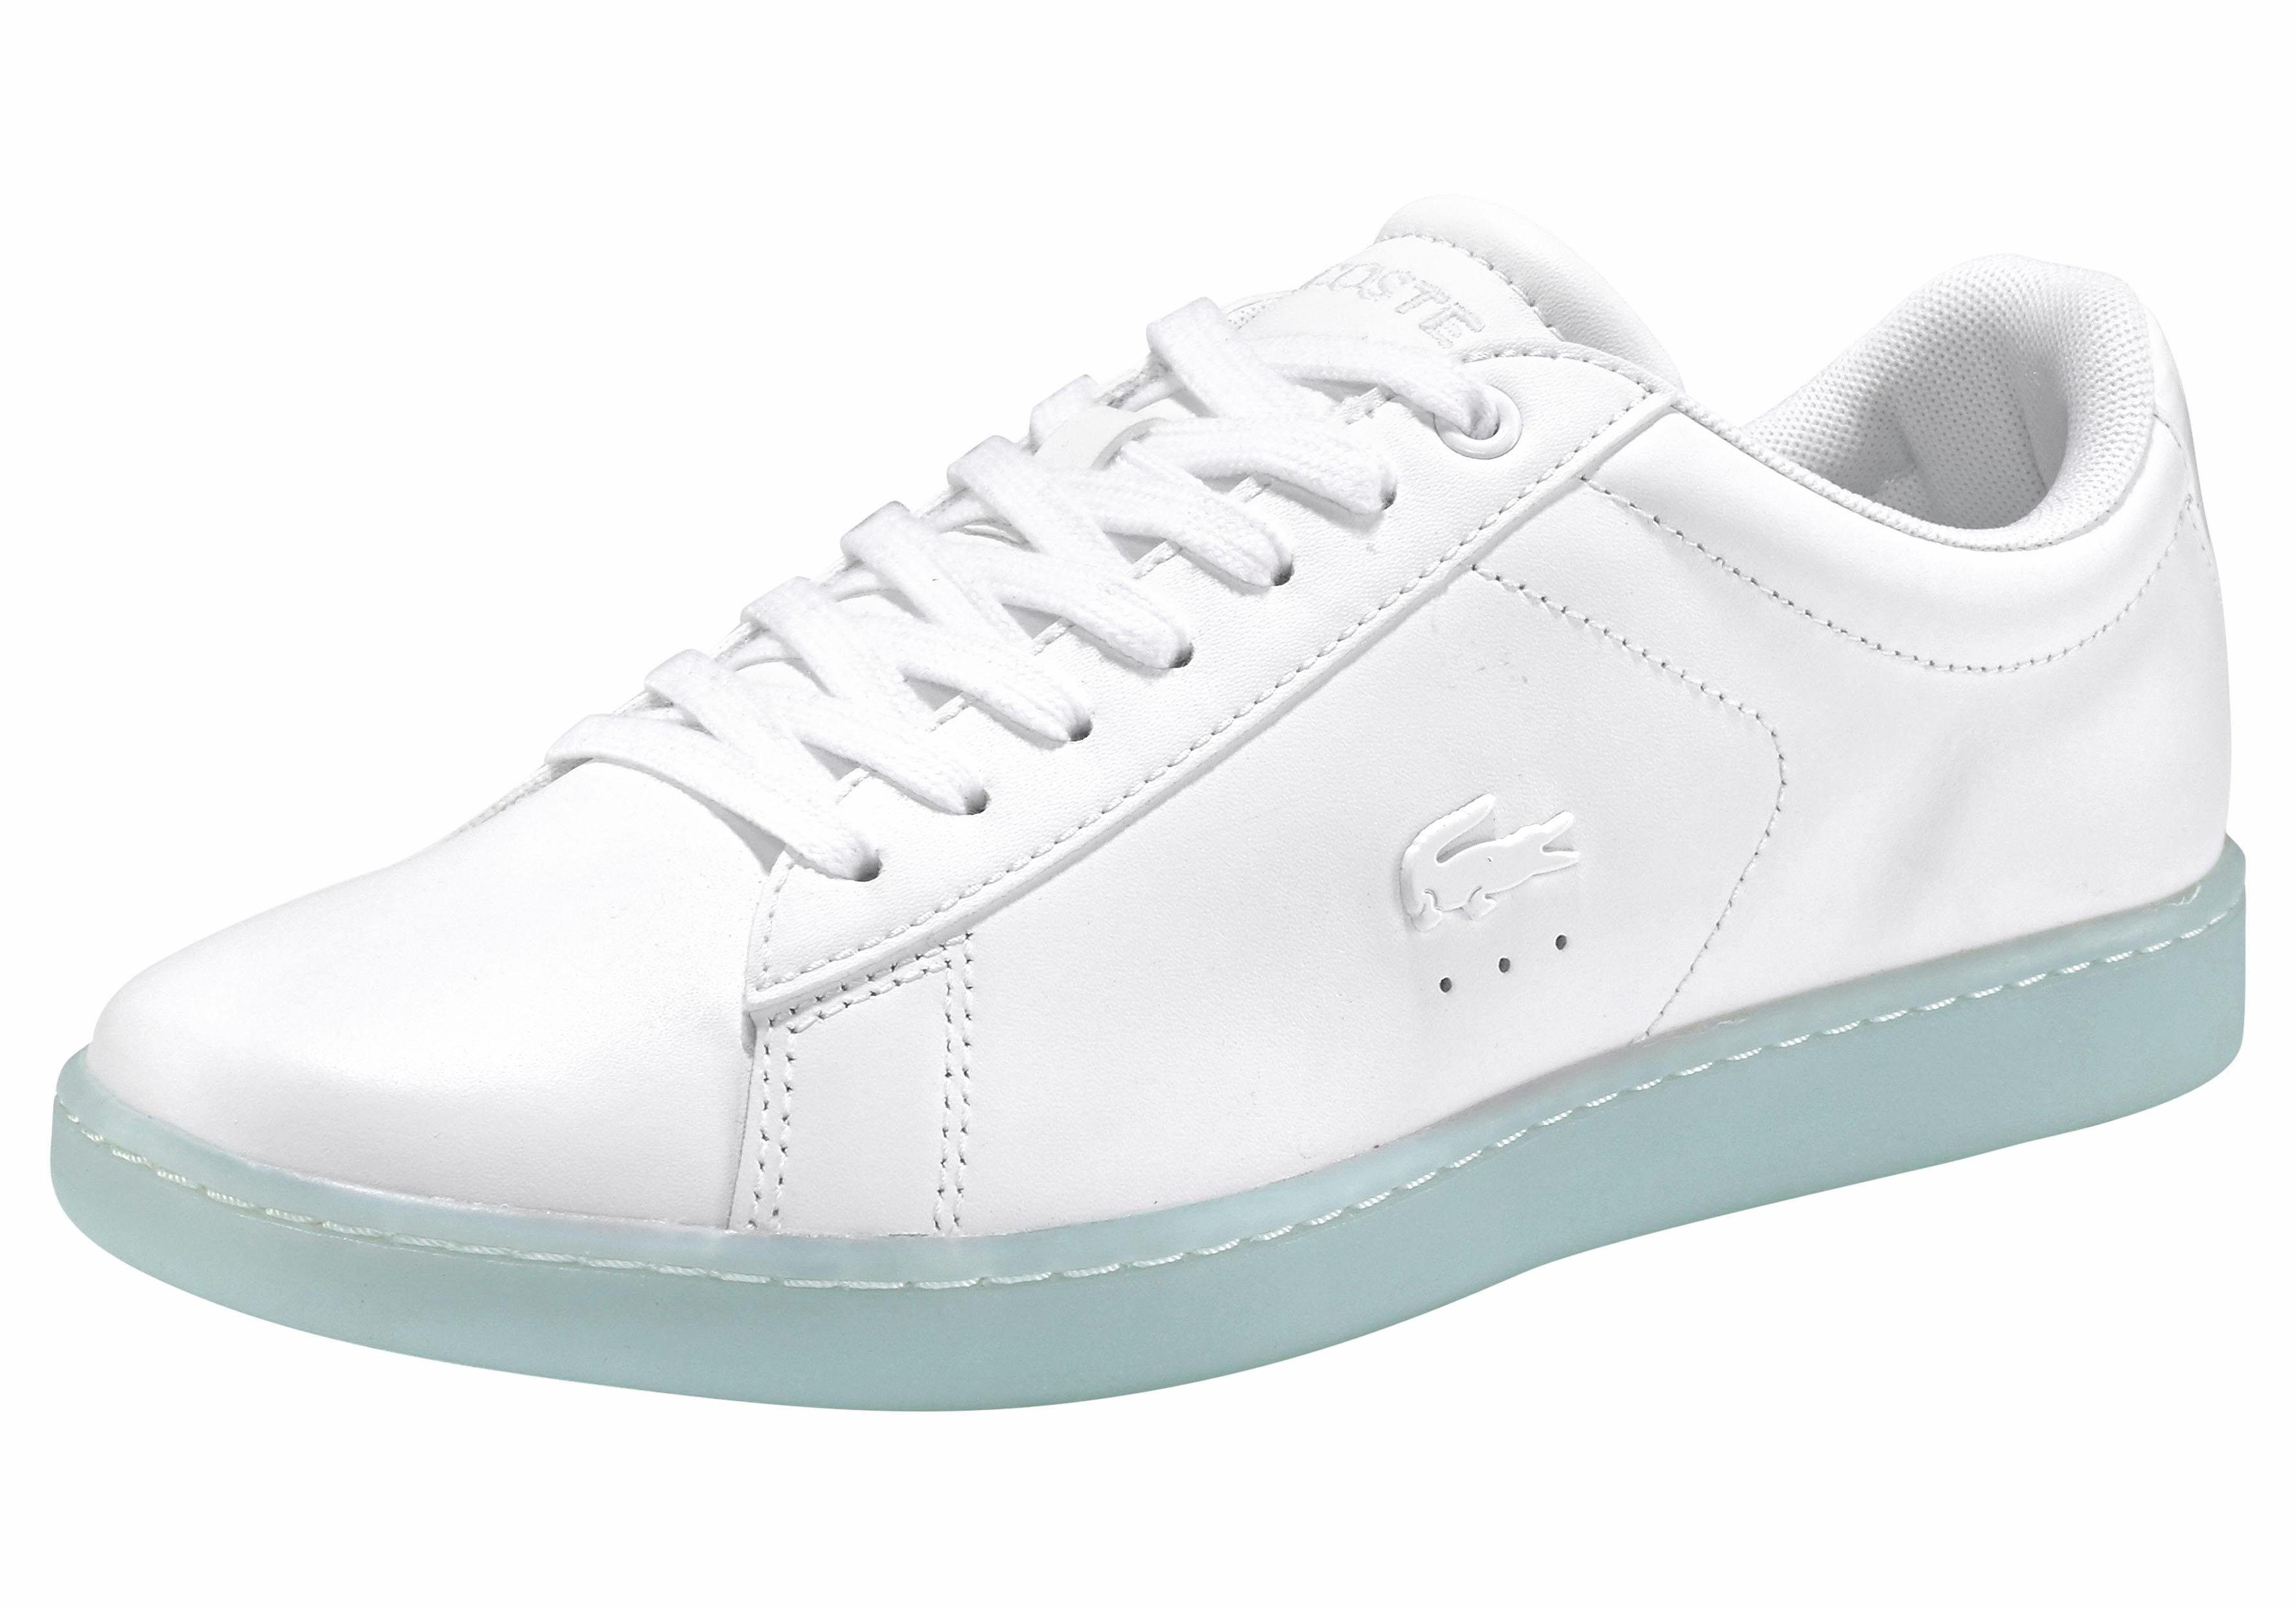 Chaussures De Sport Lage Lacoste Carnaby Evo 118 3 Femmes YfxWT